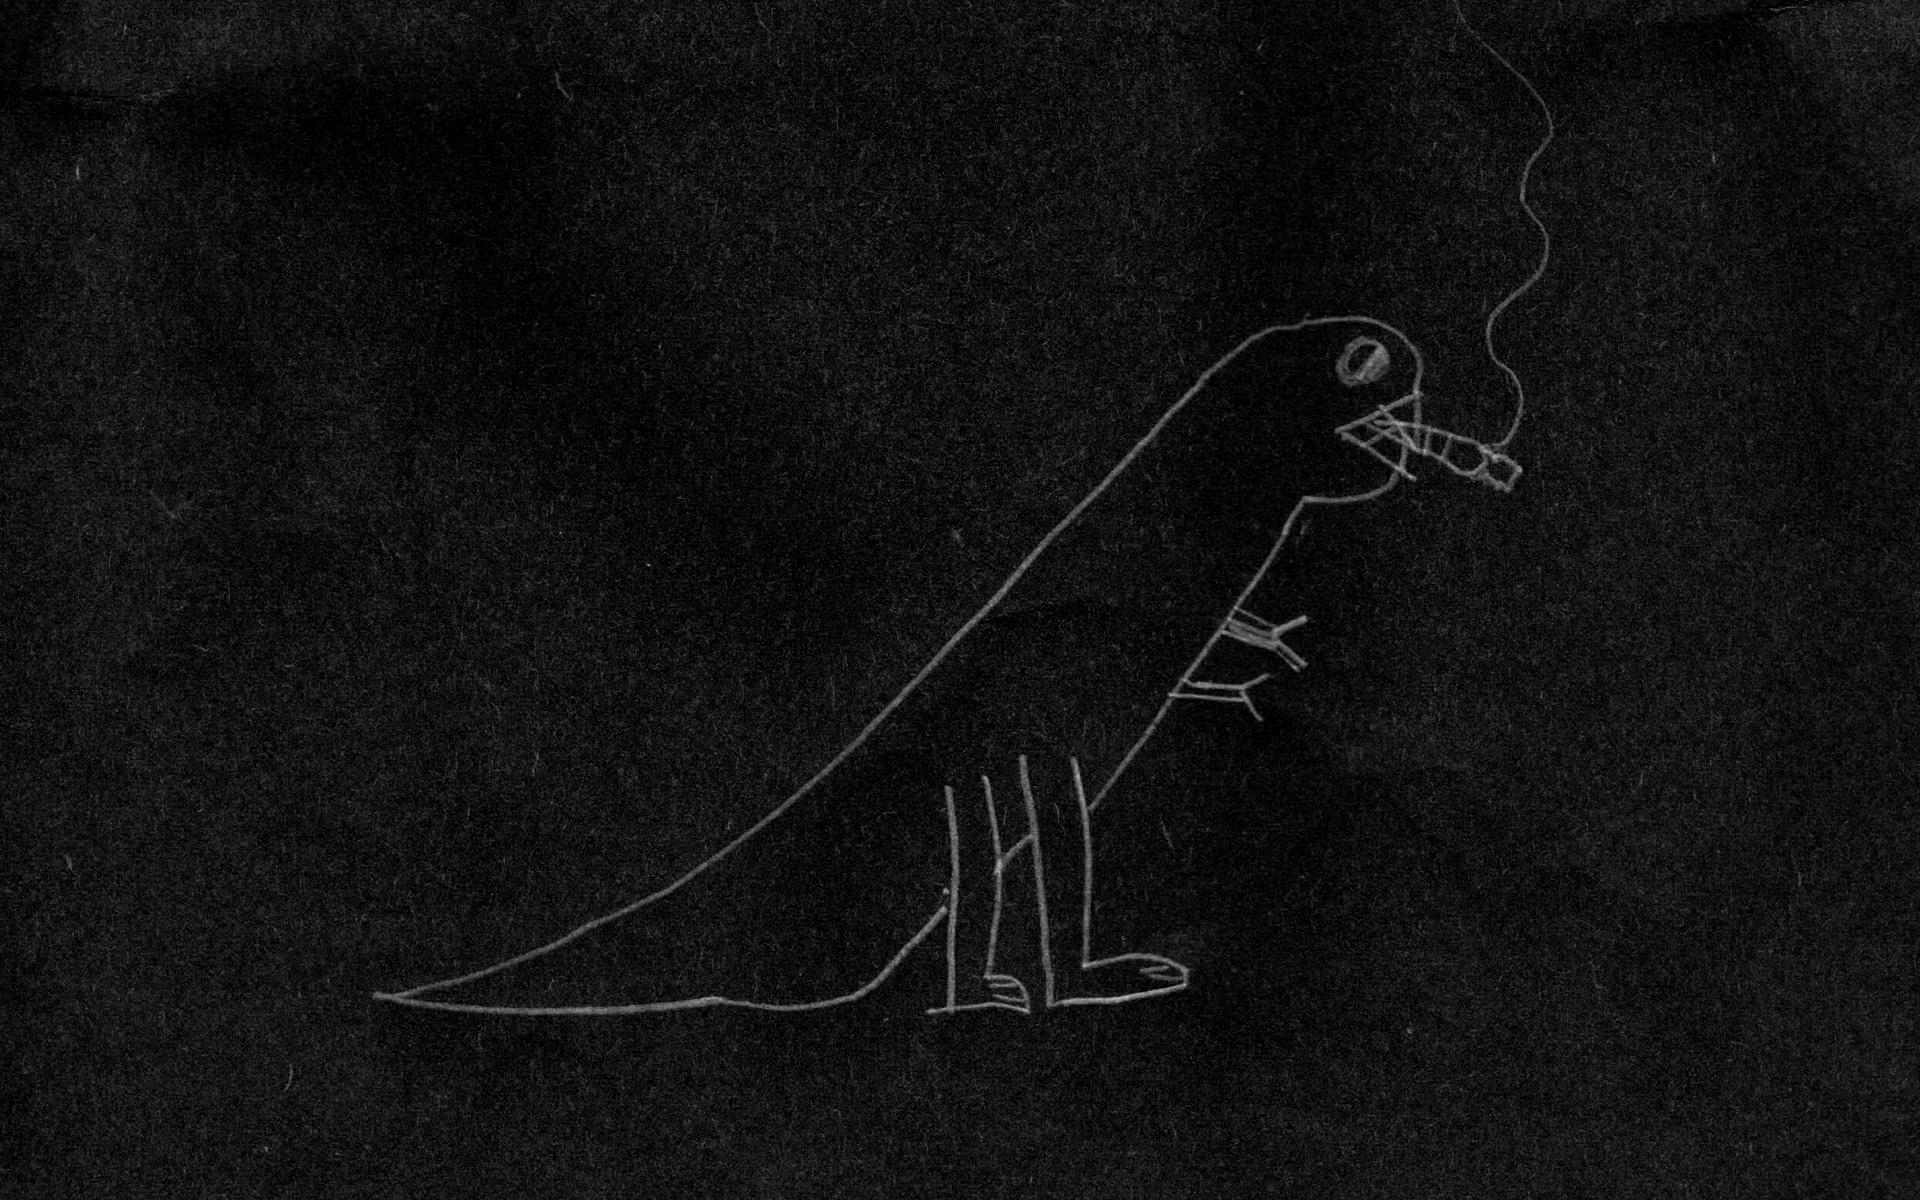 SMOKING T-REX by precurser